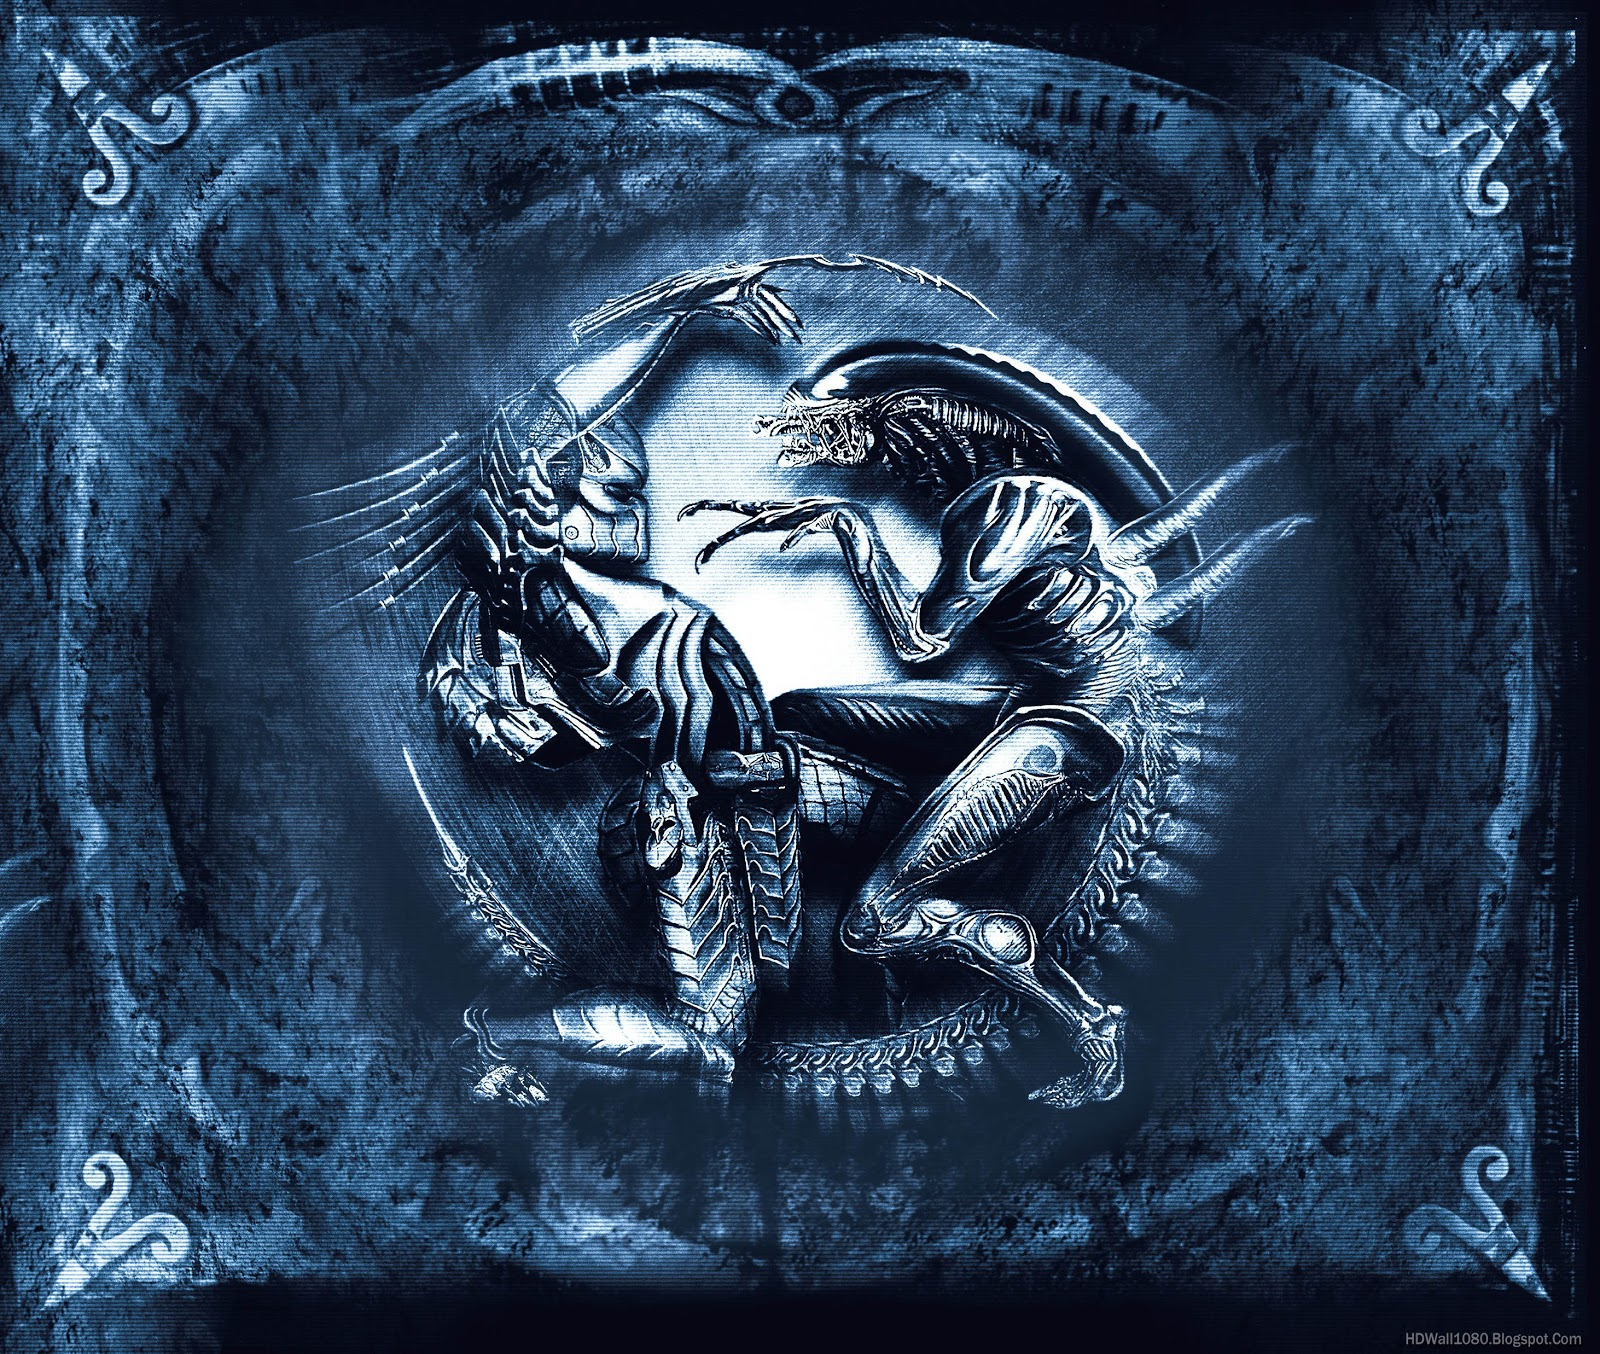 HD PC Desktop Wallpapers: Alien VS Predator Wallpaper